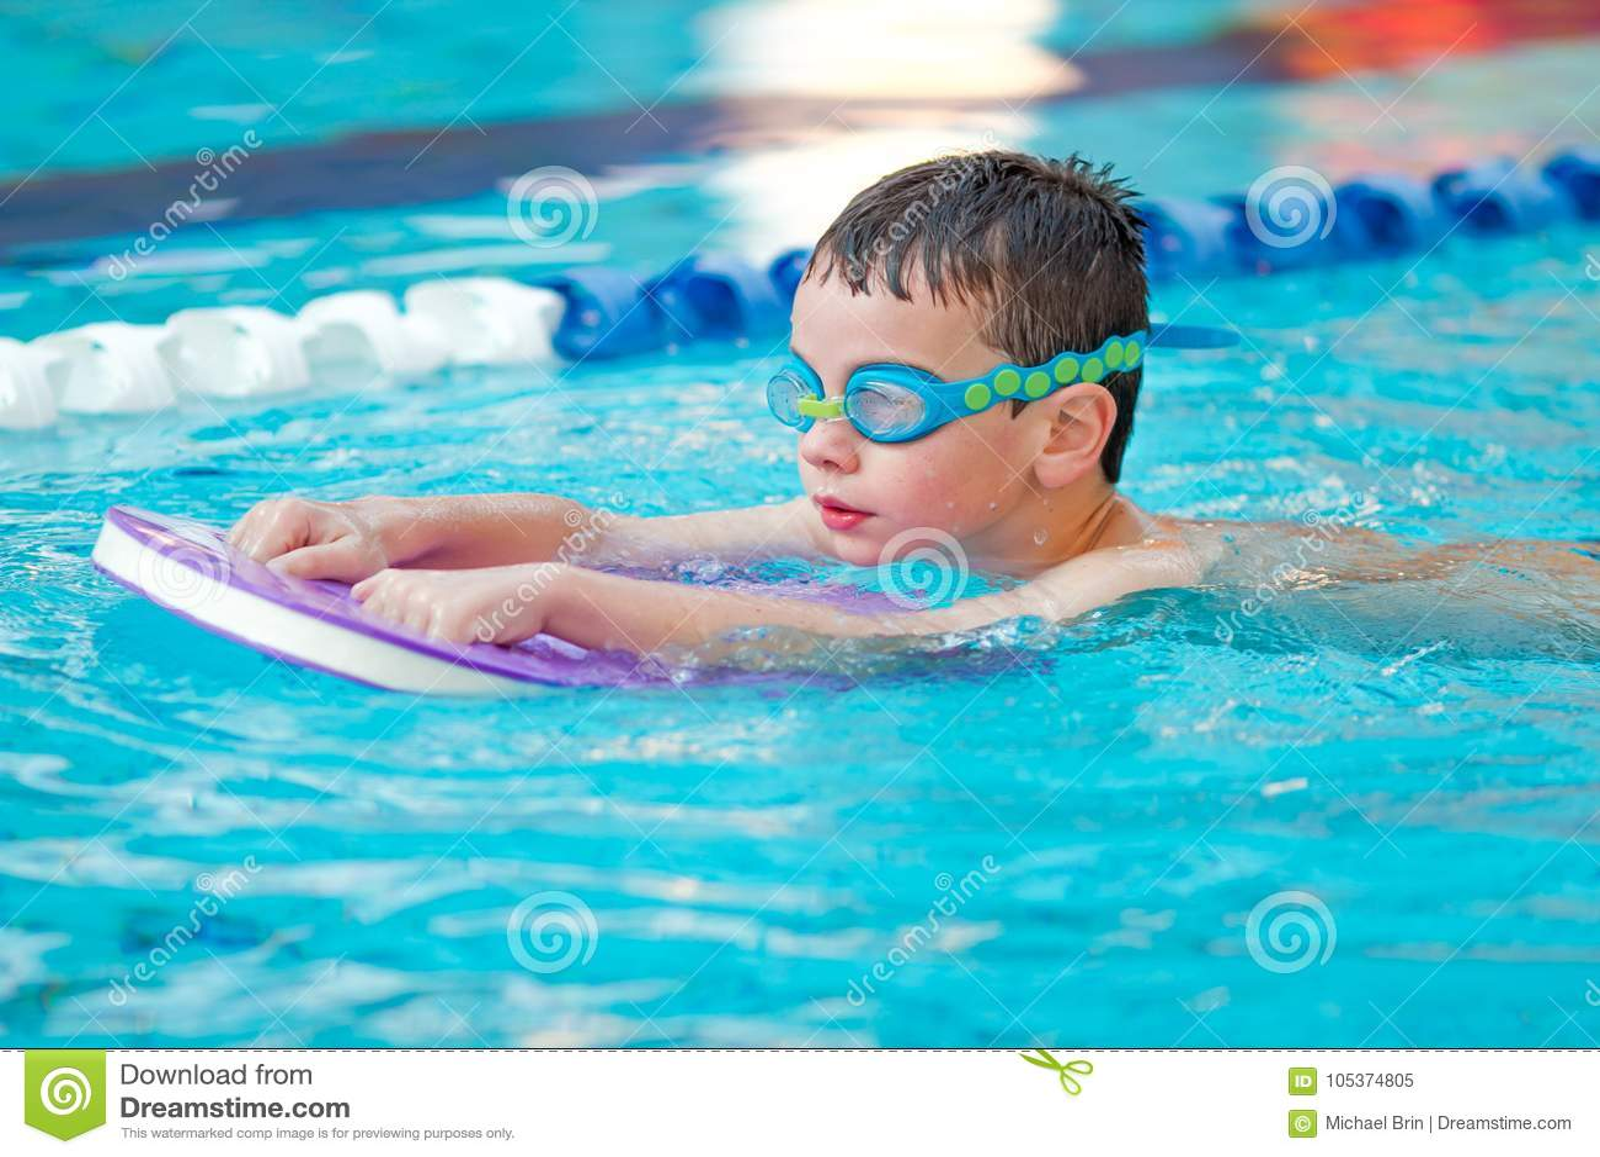 Boy Practice Swimming Stock Image Image Of Instructor 105374805